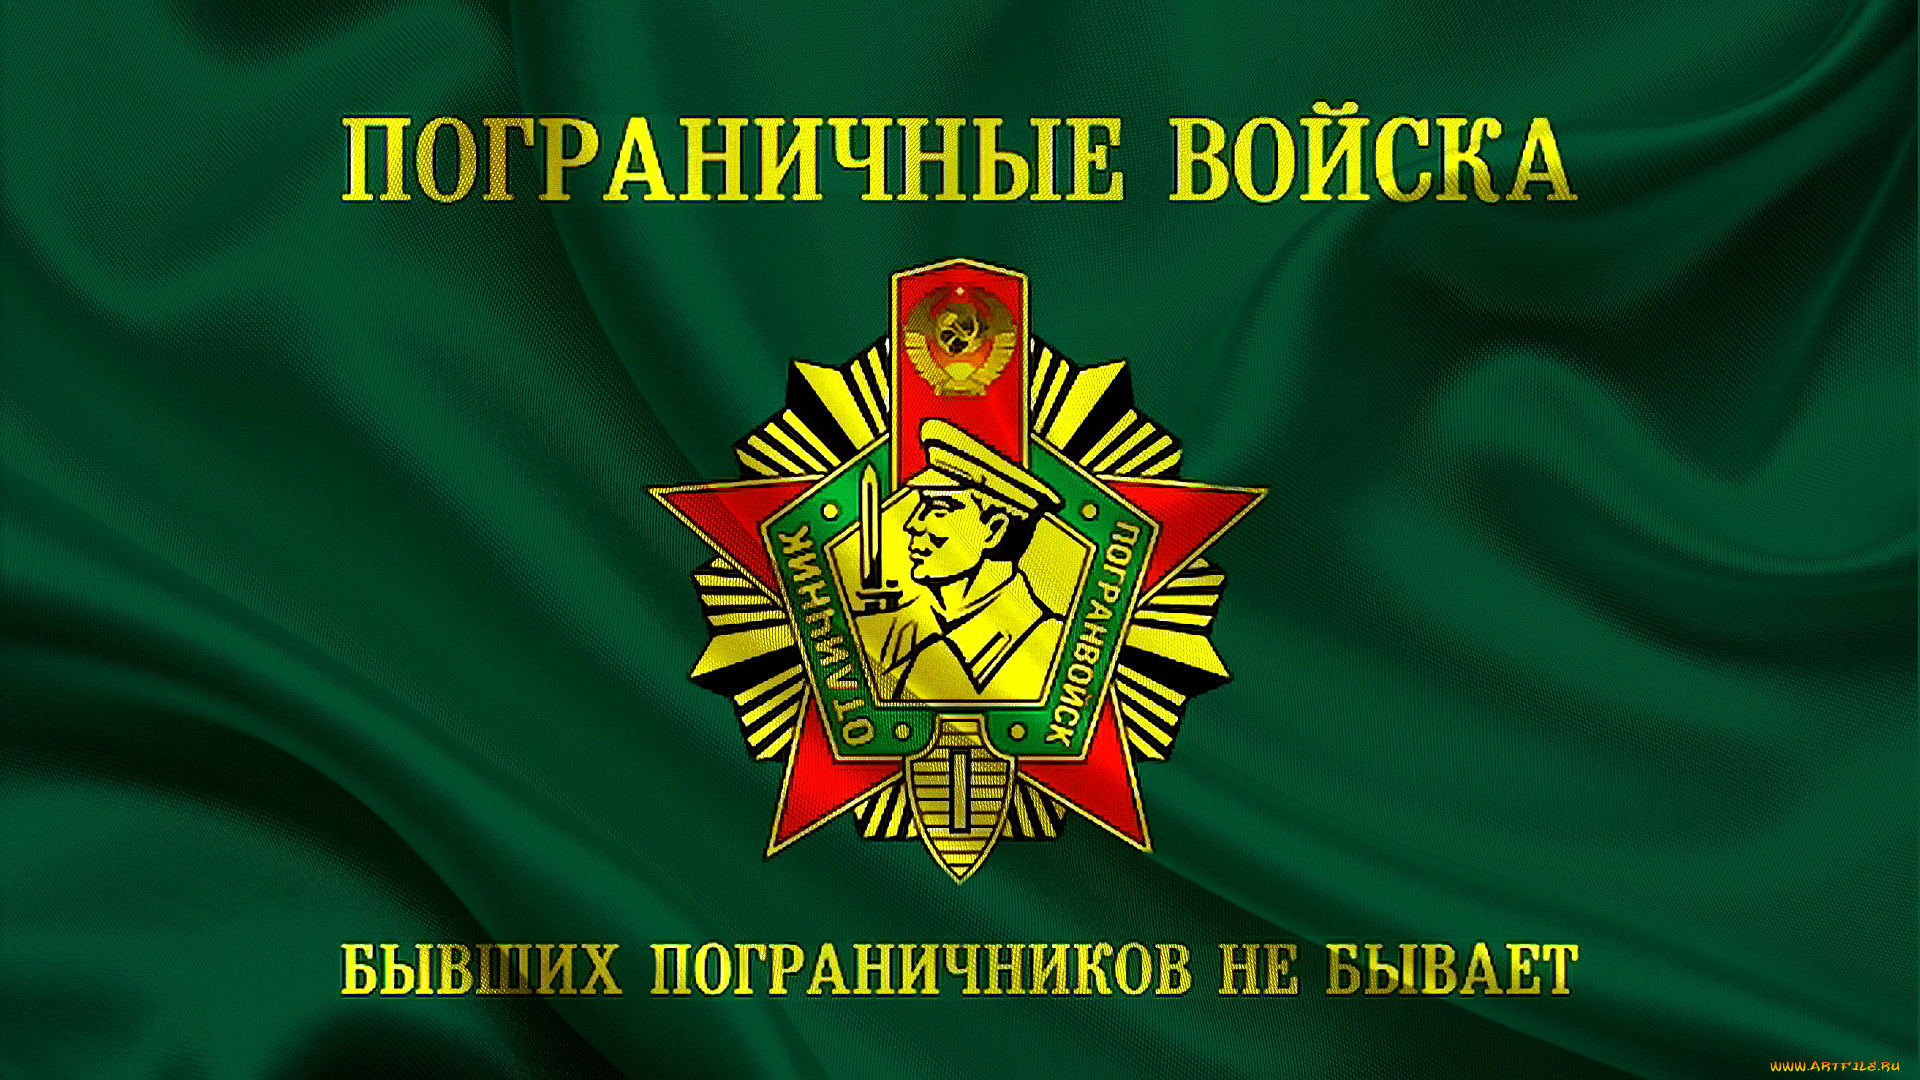 http://i.artfile.ru/1920x1080_695350_%5Bwww.ArtFile.ru%5D.jpg